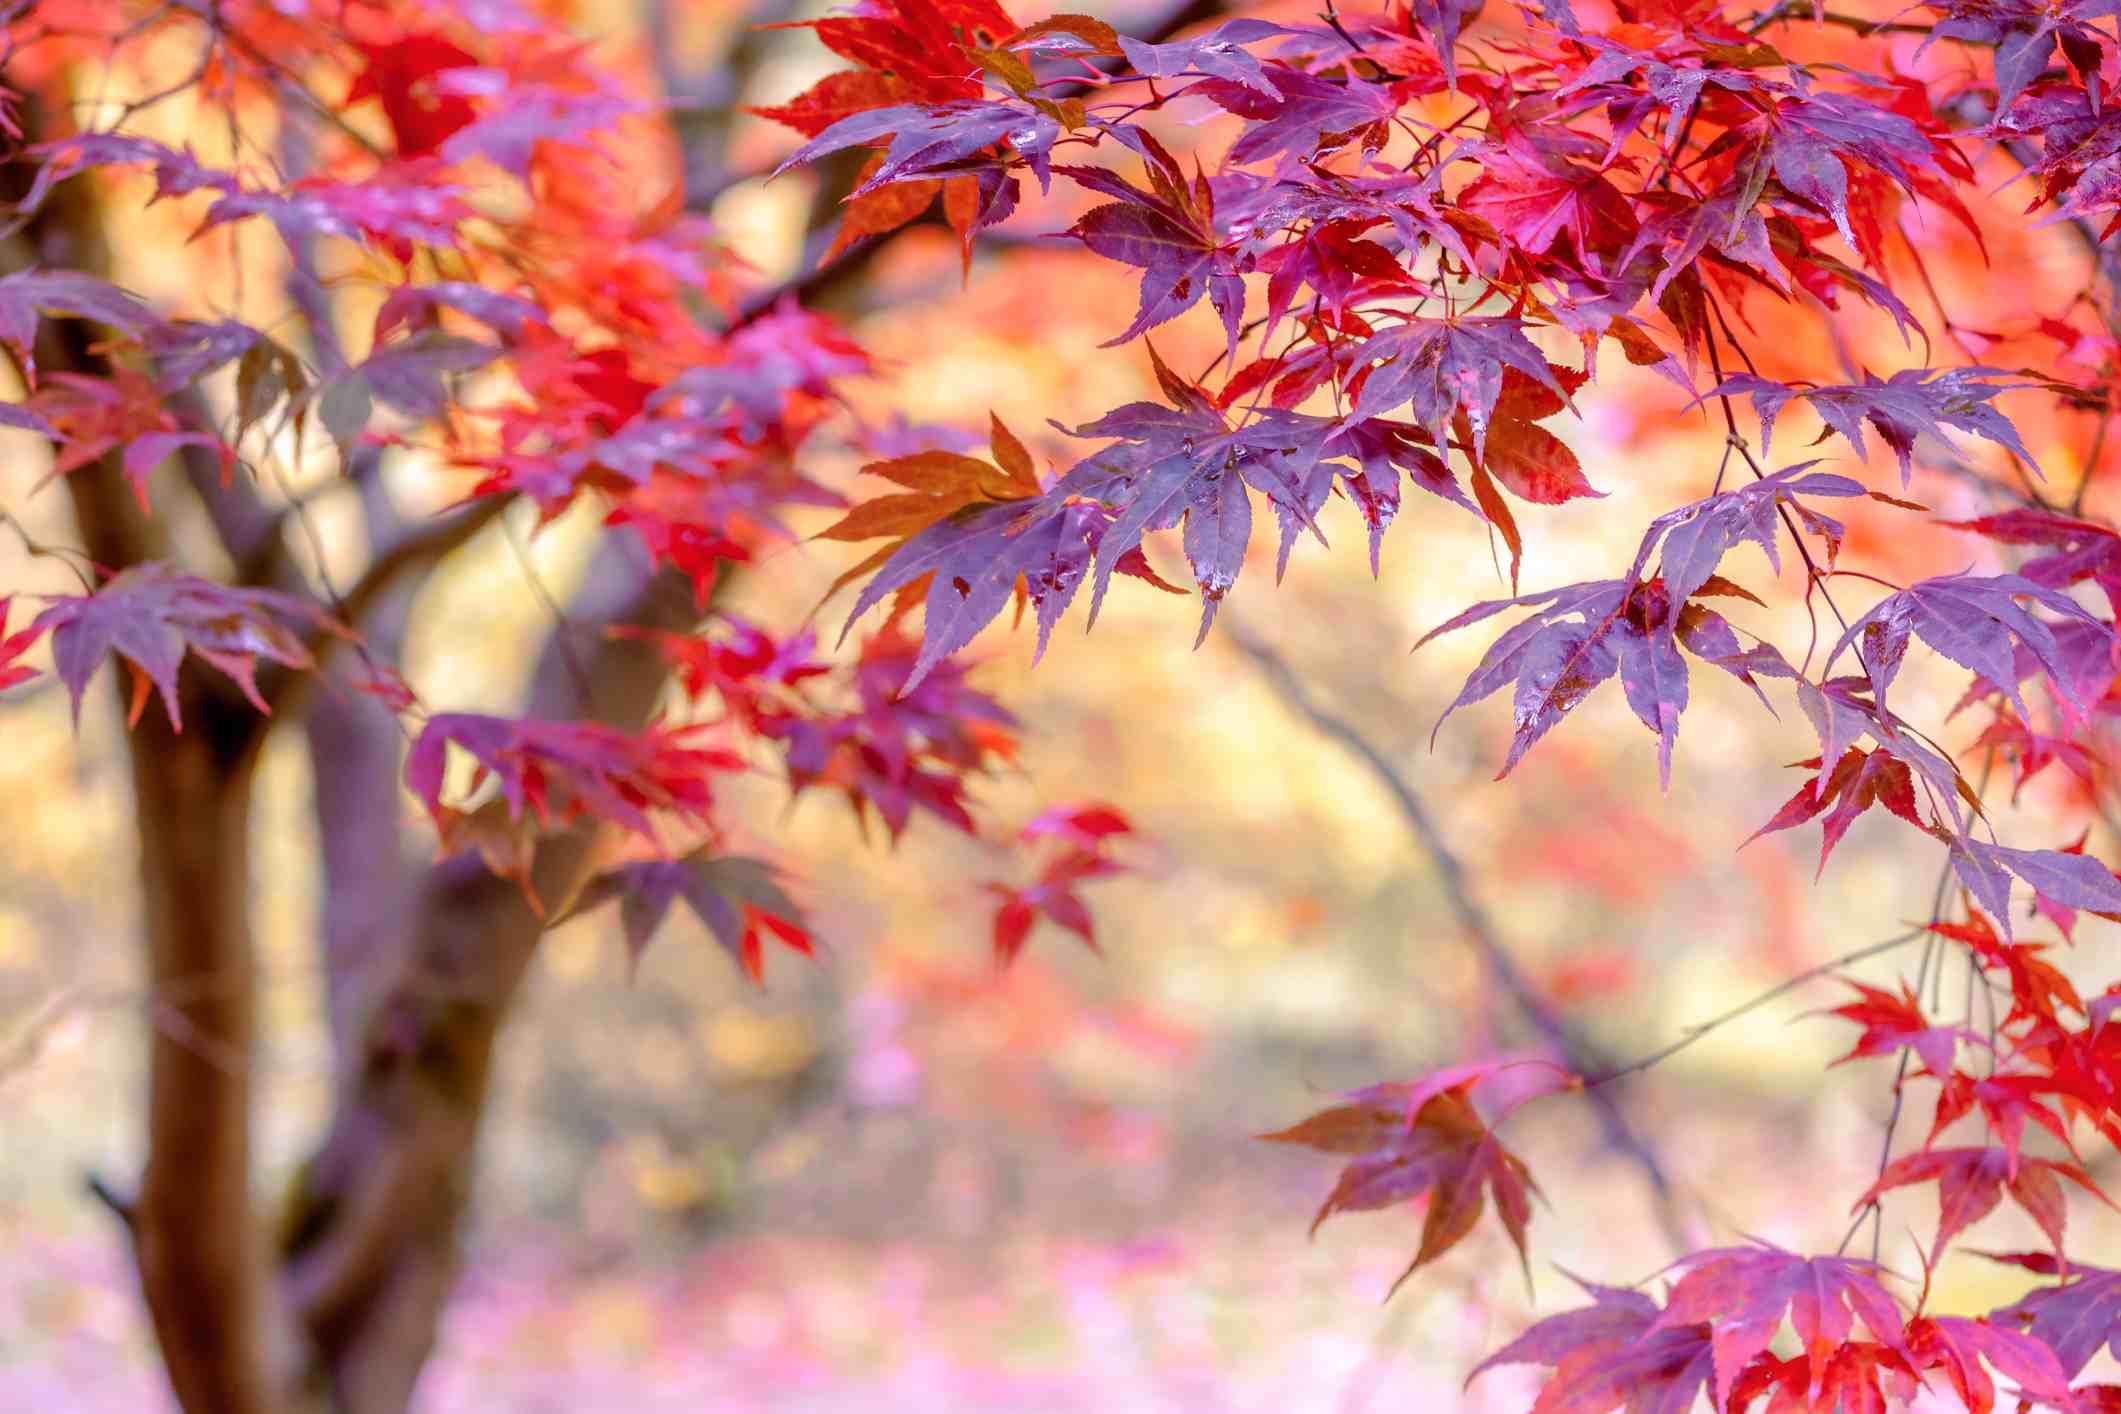 Bloodgood Japanese maple tree with dark red leaves.